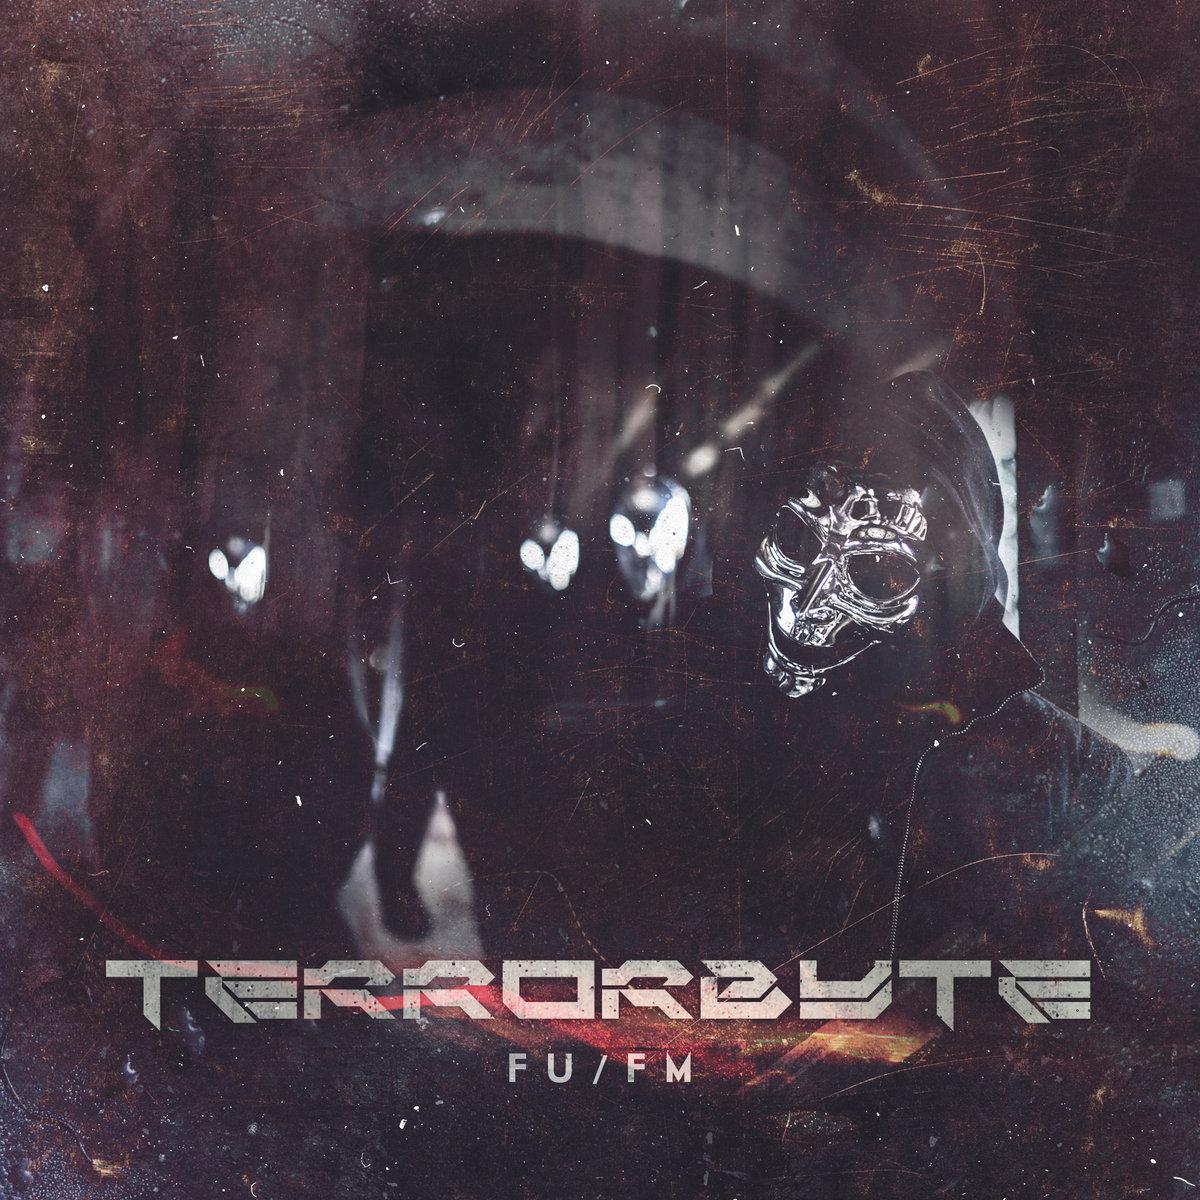 Terrorbyte - FU/FM [EP] (2015)